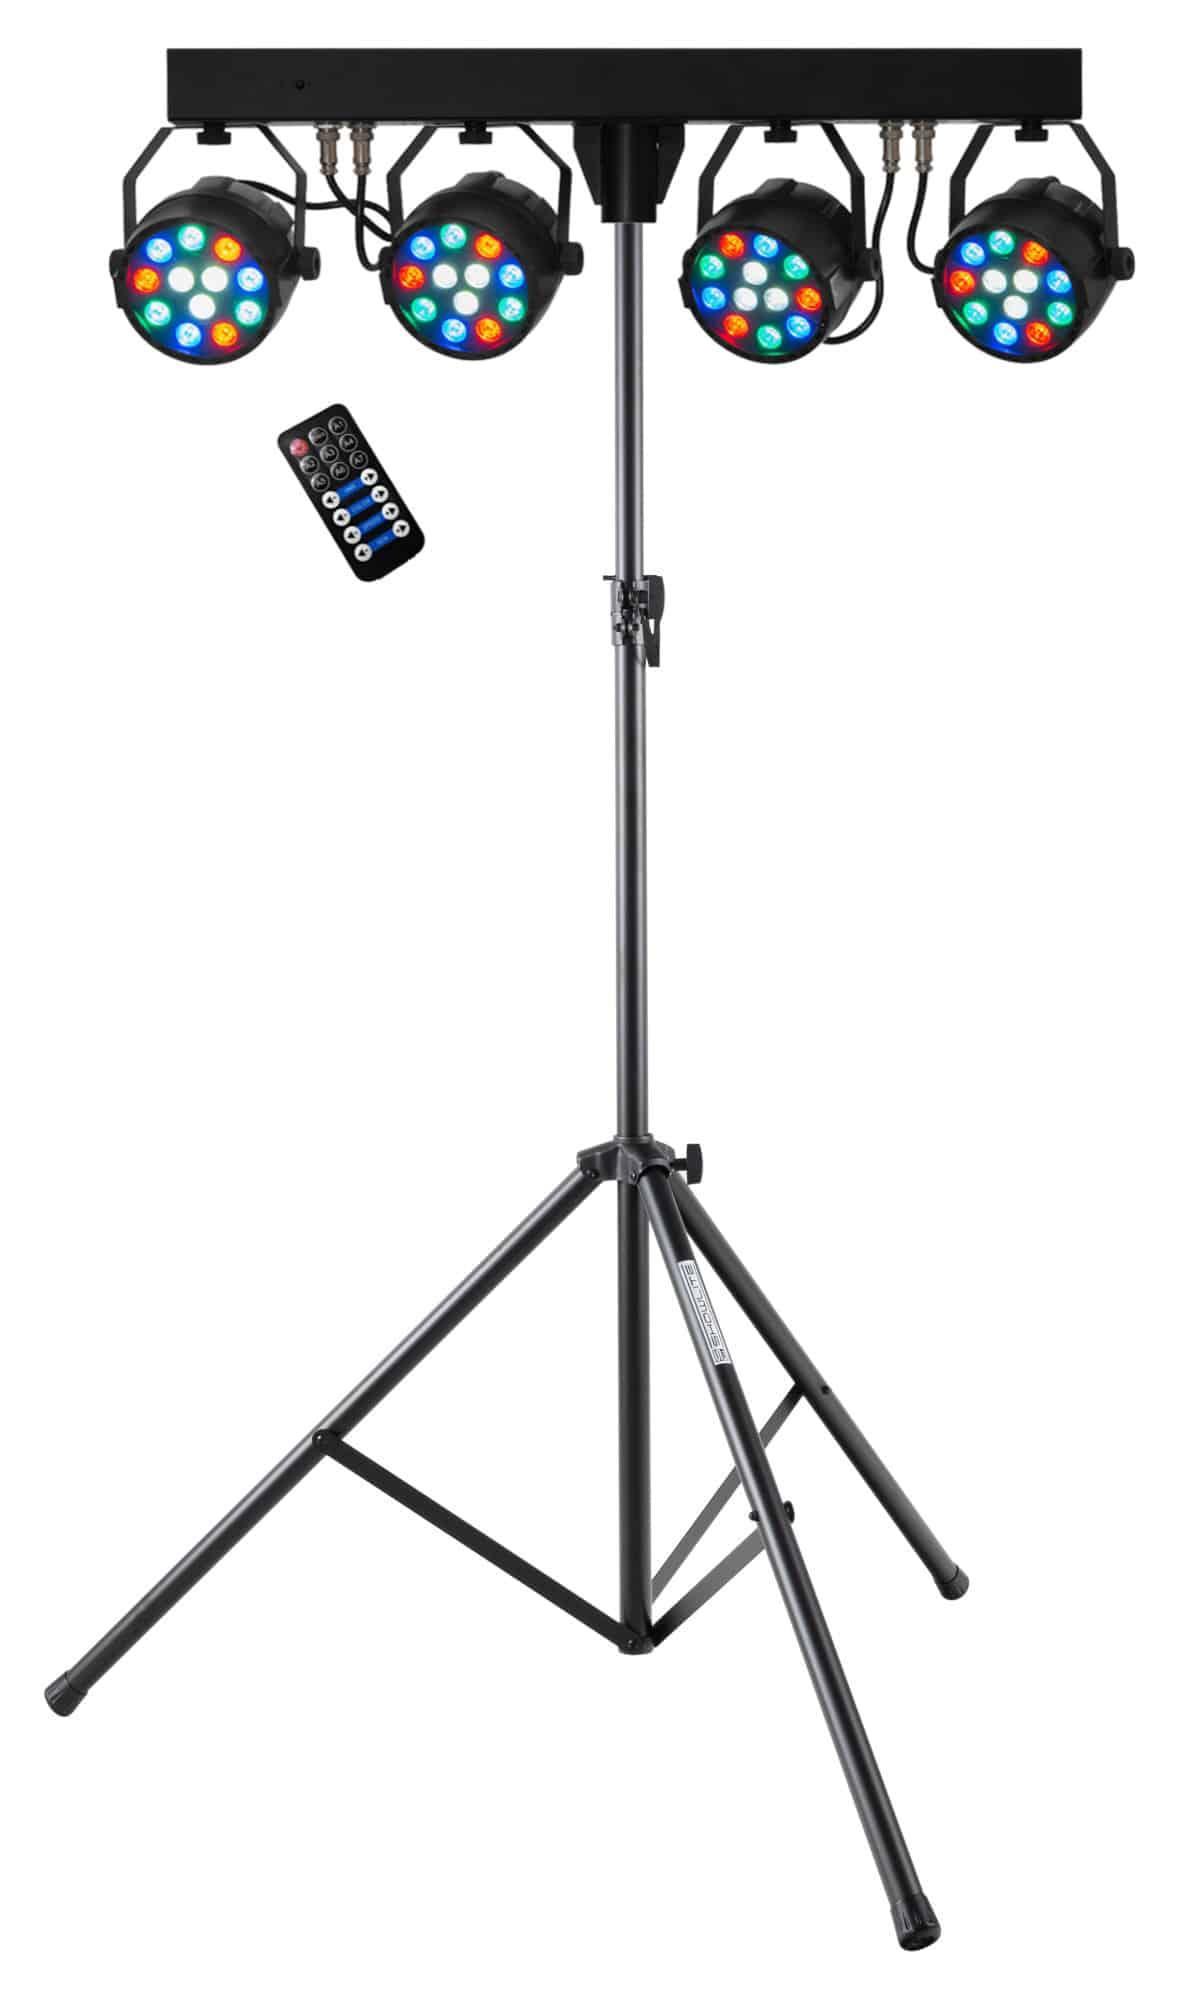 Lichtsets - Eurolite LED KLS PARty Kompakt Lichtset mit Stativ - Onlineshop Musikhaus Kirstein